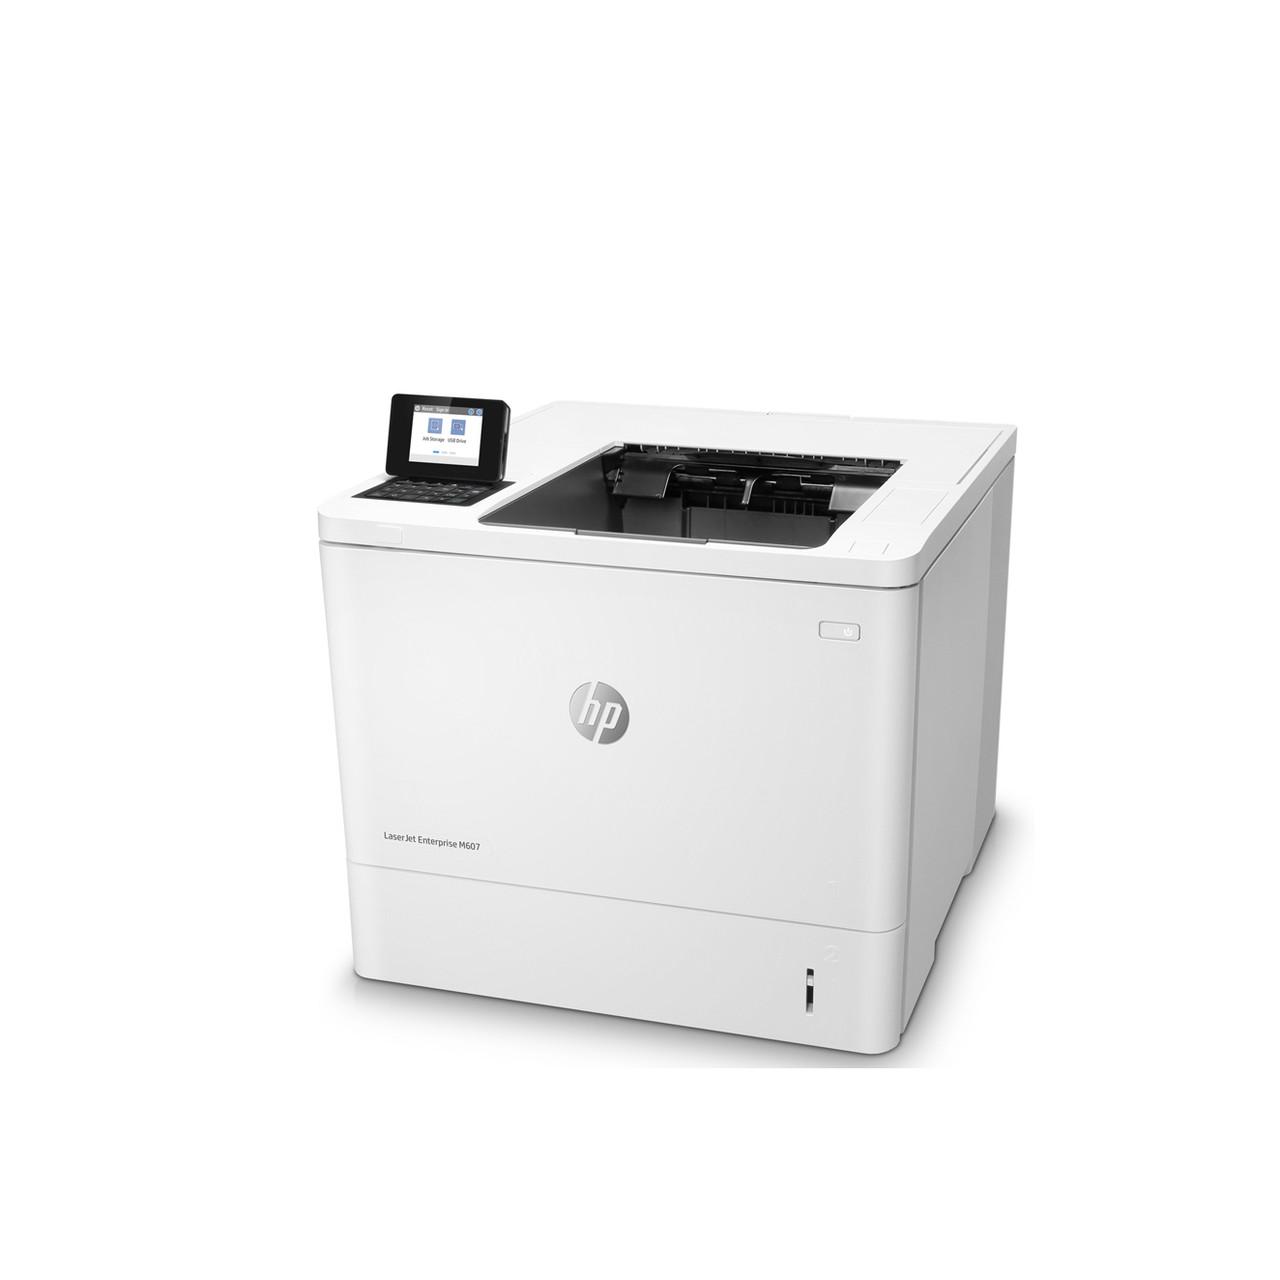 Принтер HP LaserJet Enterprise M607n B (А4, Лазерный, Монохромный (черно - белый), USB, Ethernet) K0Q14A